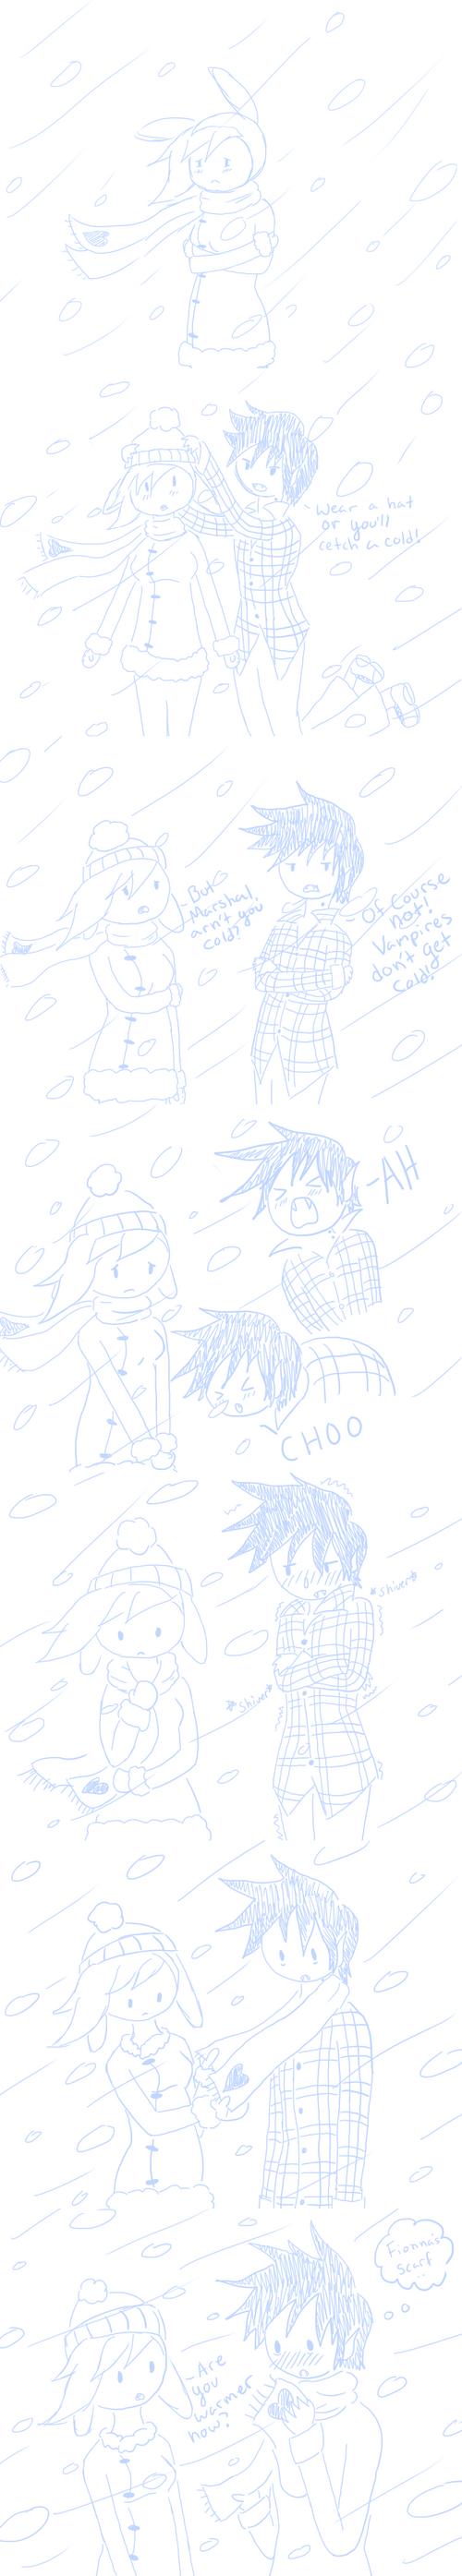 Snow comic